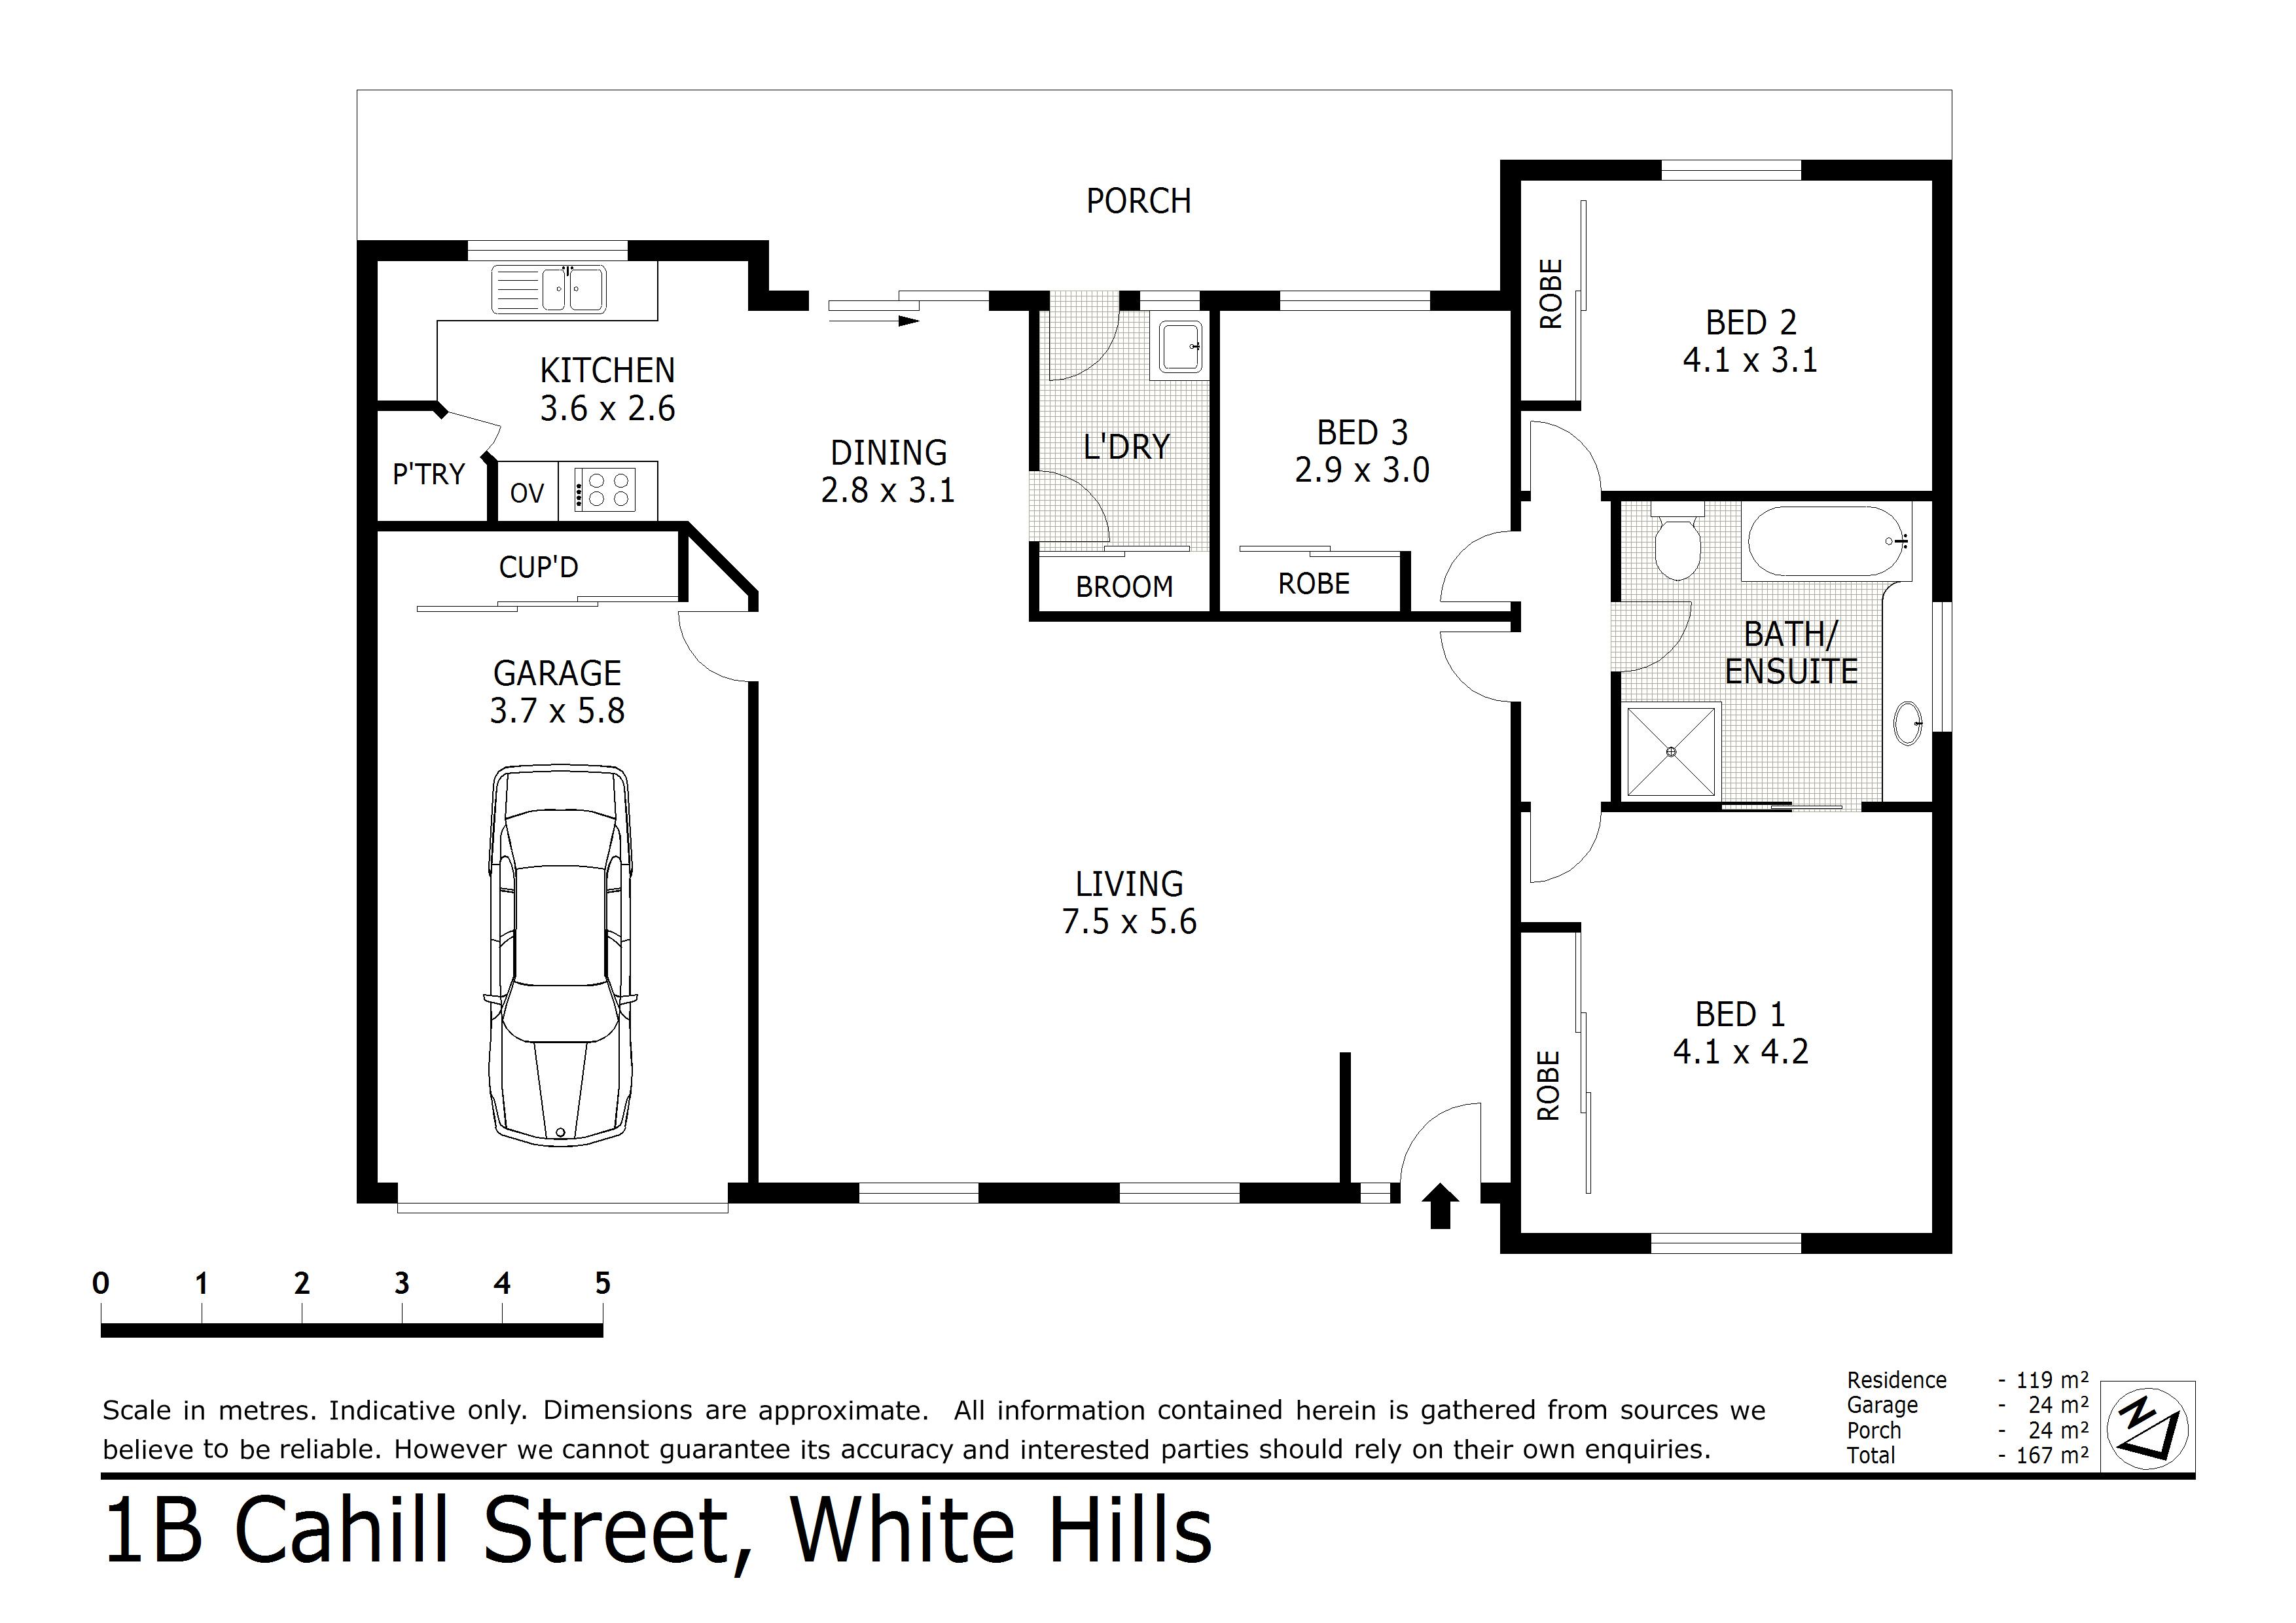 1B Cahill Street, White Hills, VIC 3550